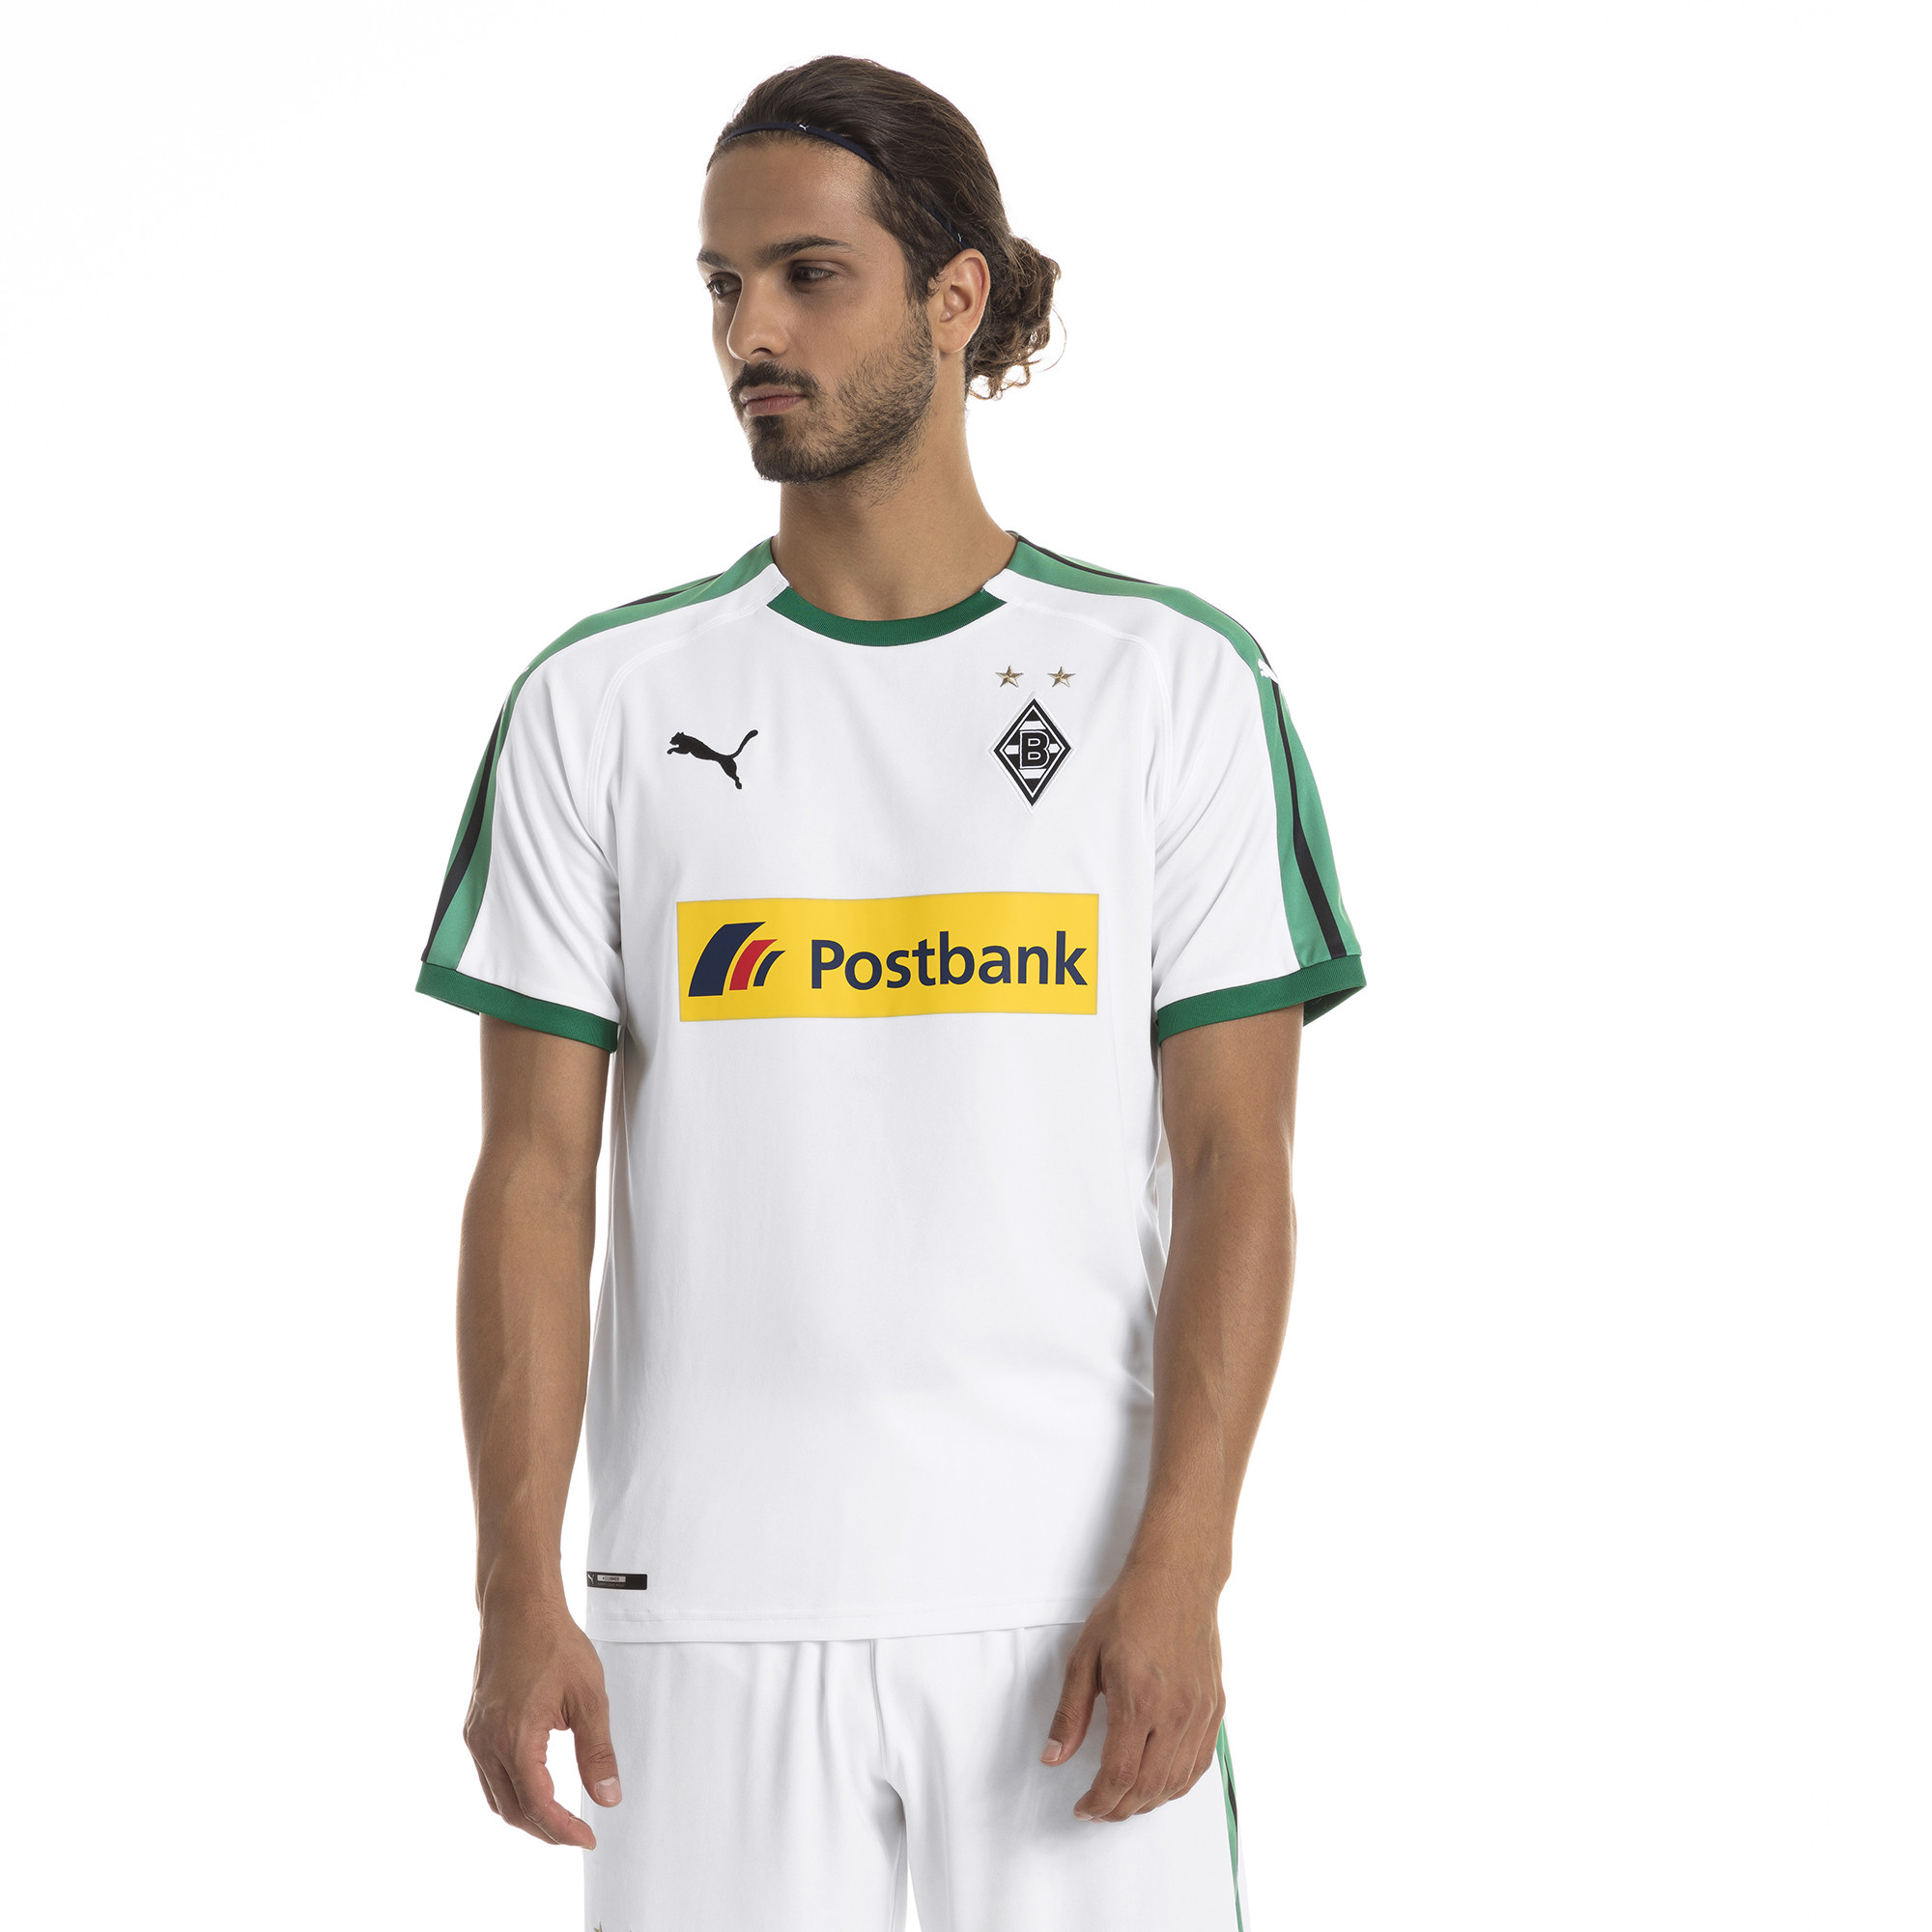 Indexbild 9 - PUMA Borussia Mönchengladbach Herren Replica Heimtrikot Männer Fußballtrikot Neu